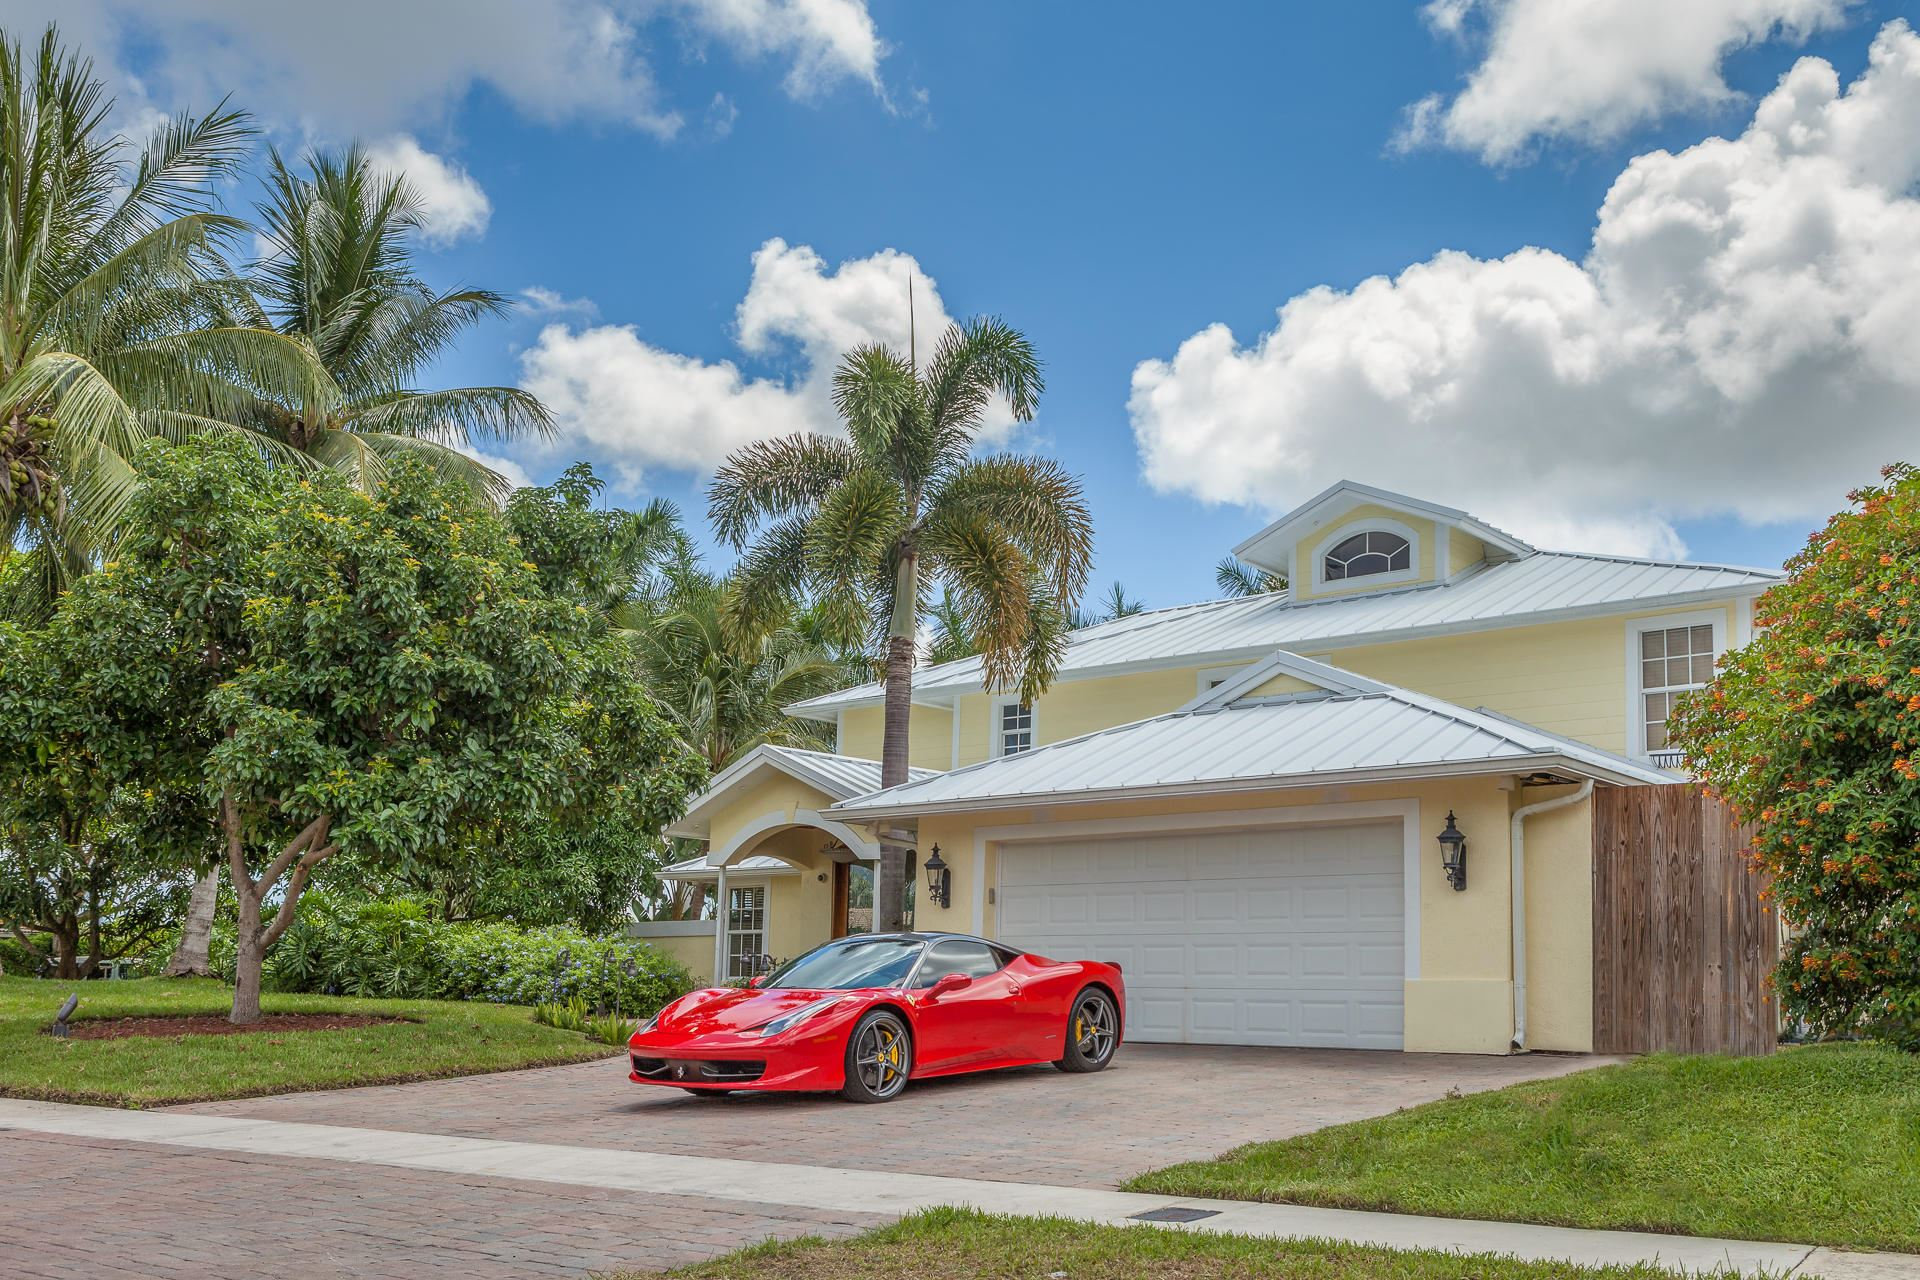 5844 Pinebrook Drive, Boca Raton, FL 33433 - #: RX-10647512